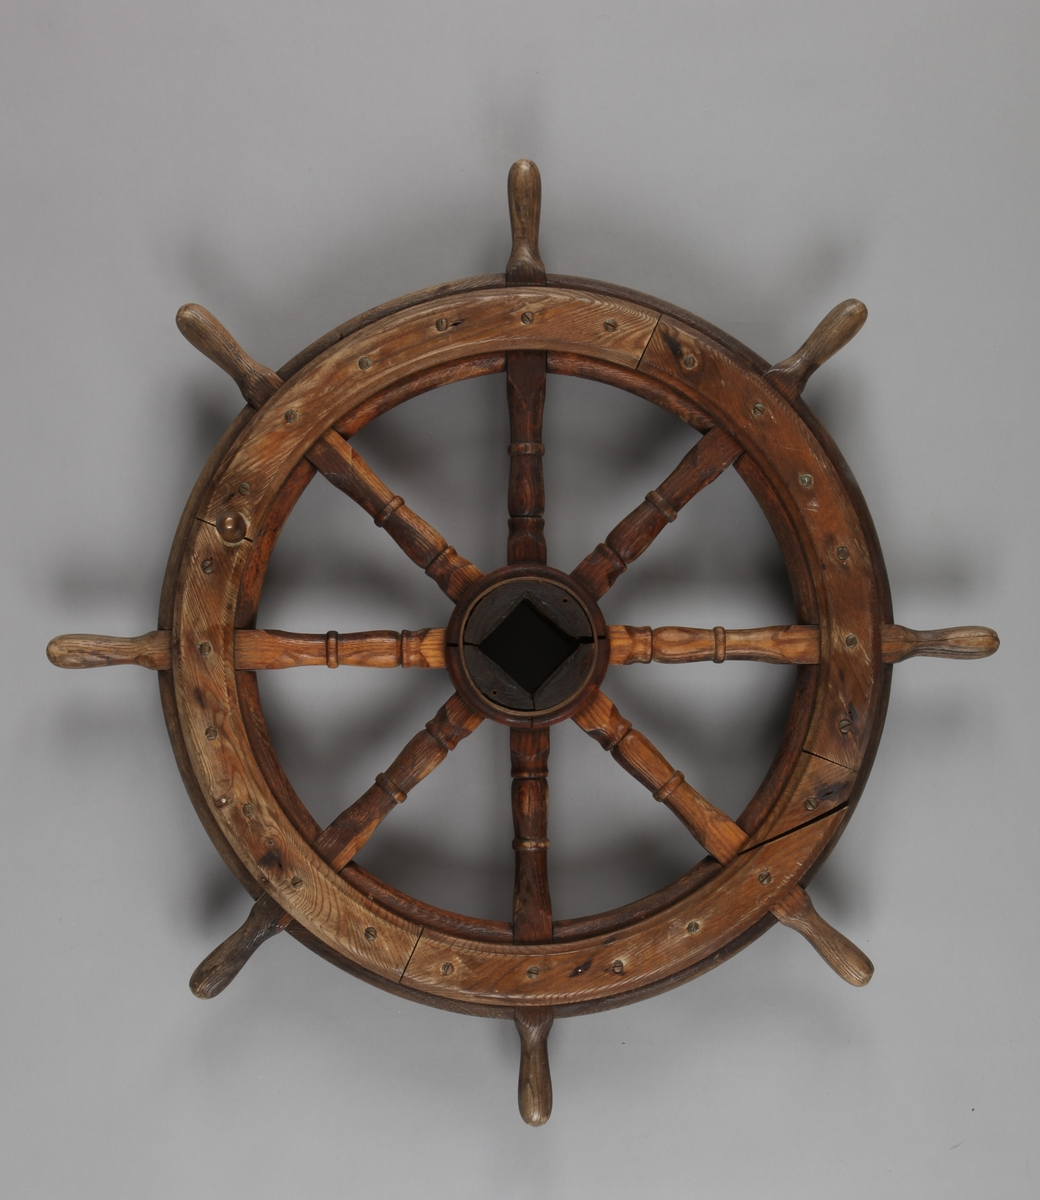 Skipsratt i tre med 8 stk. knagger på rattet